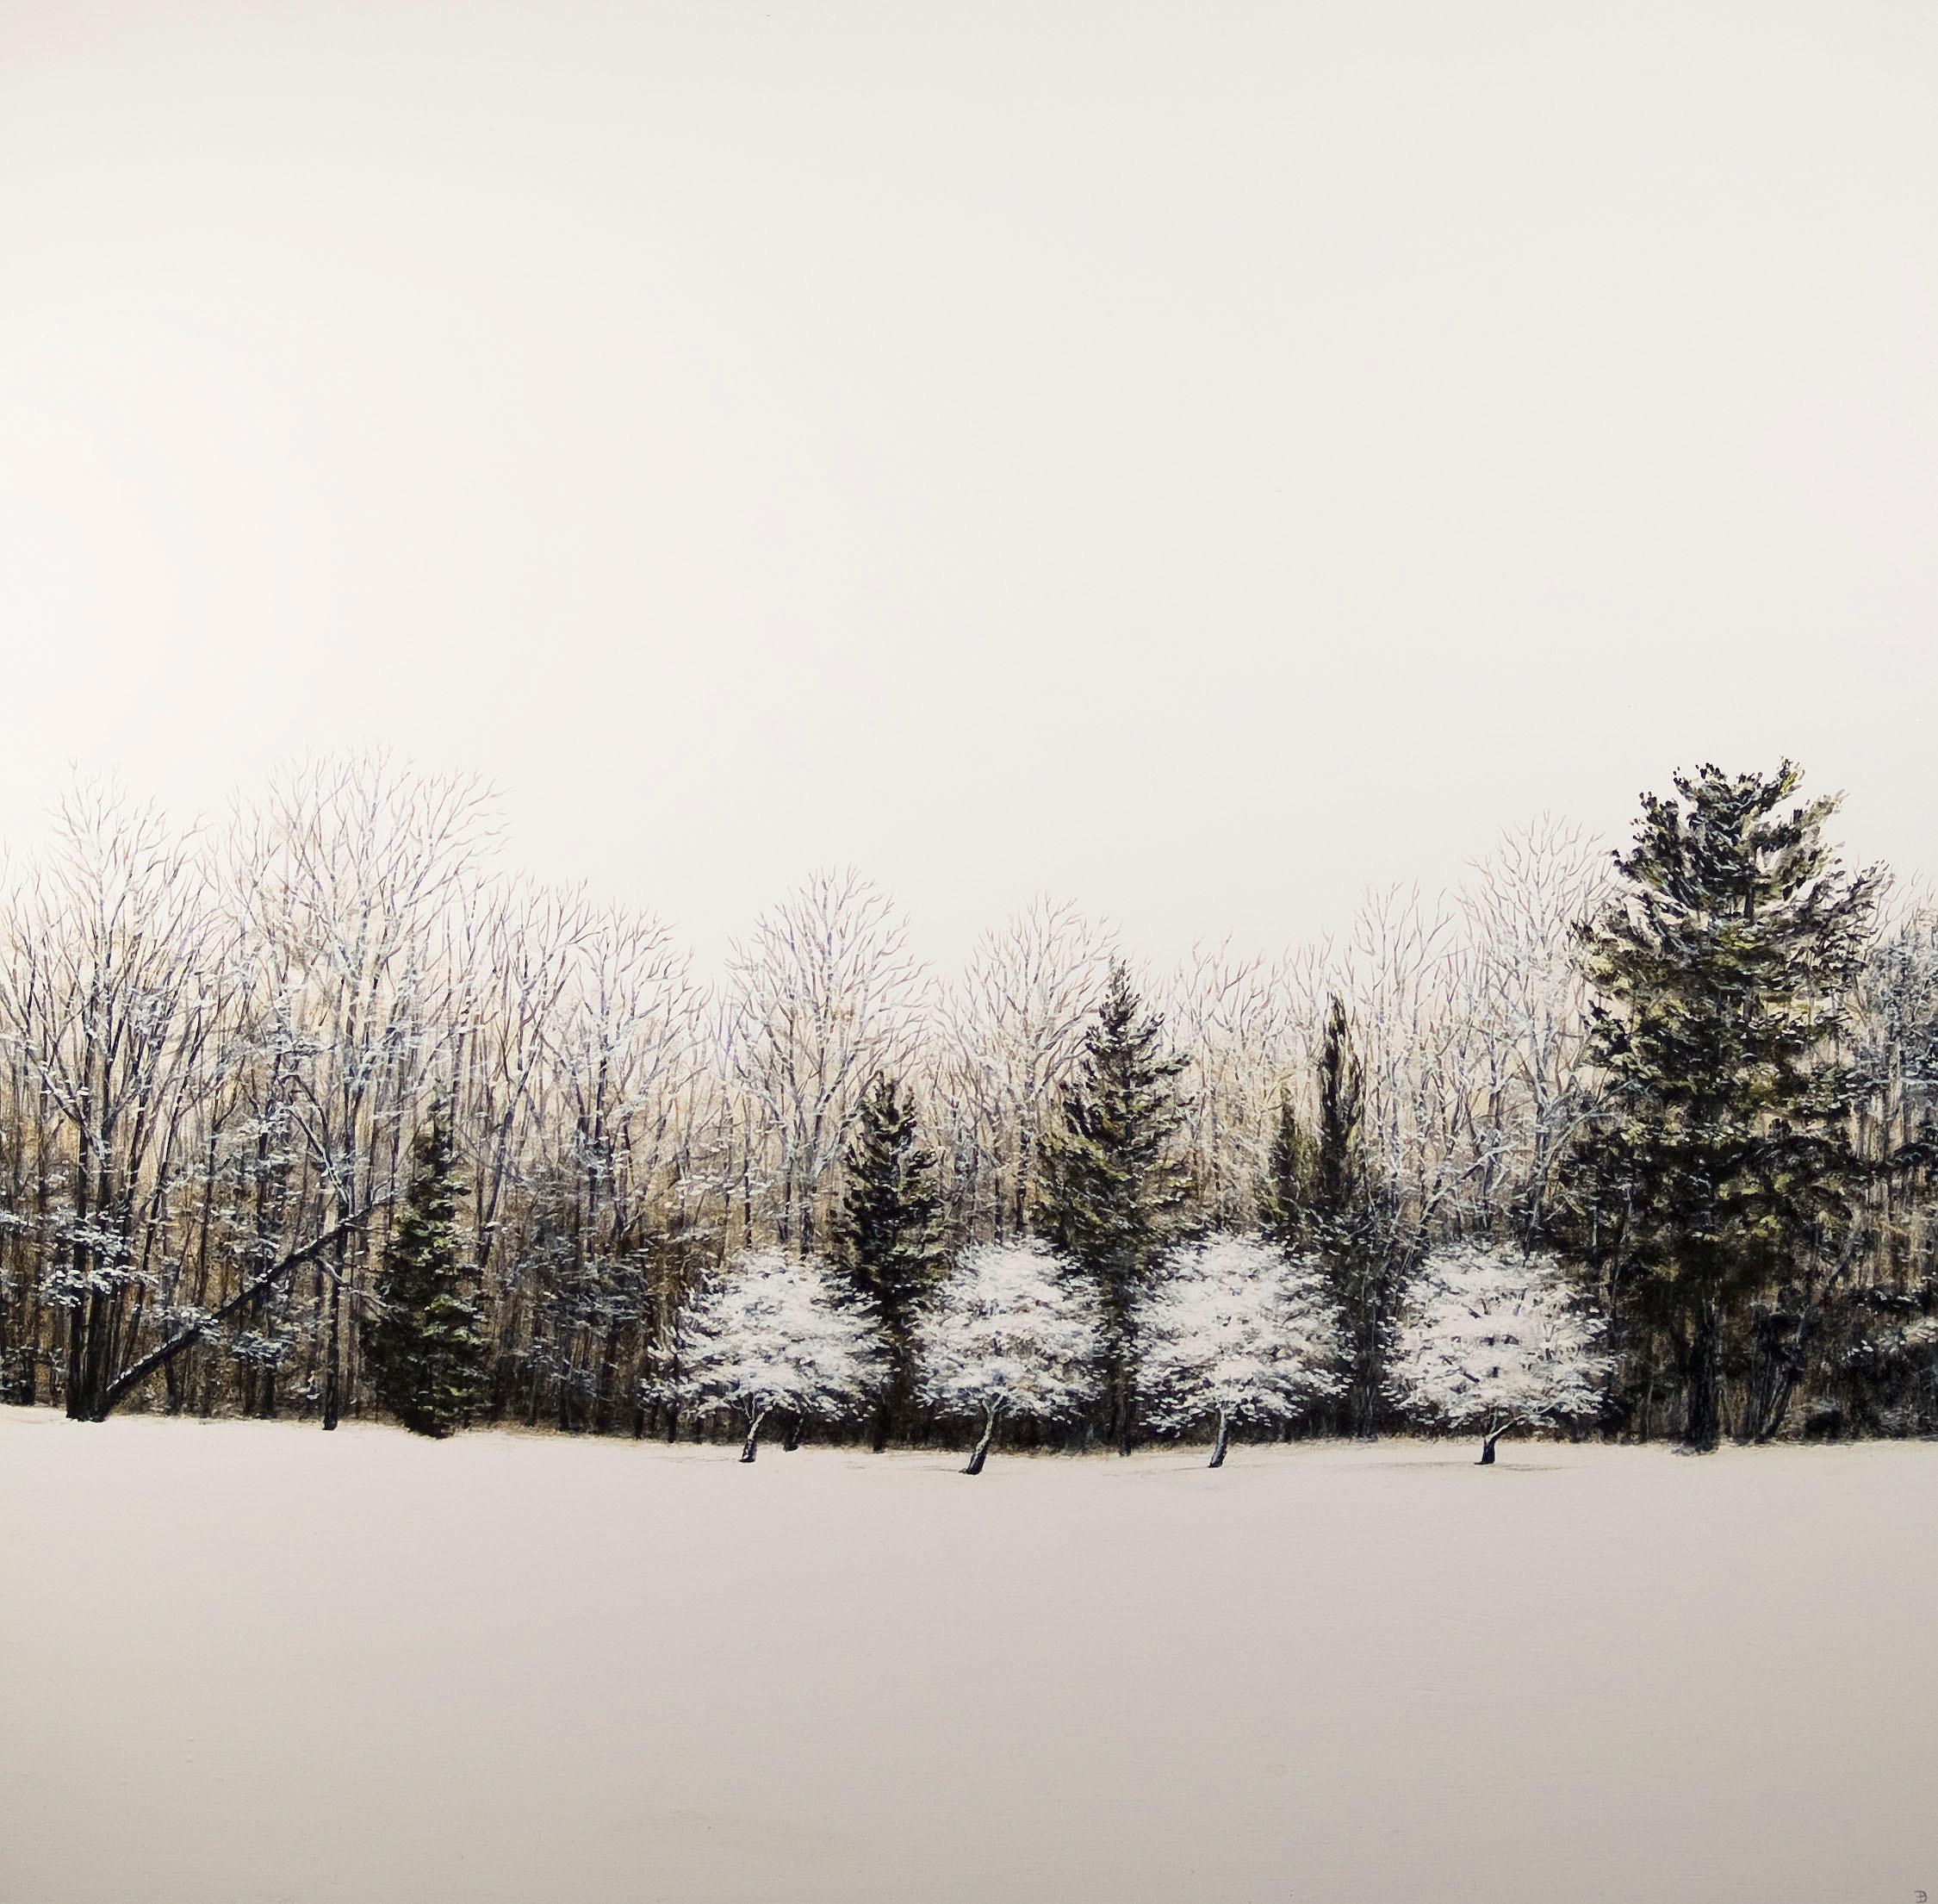 whitefield I